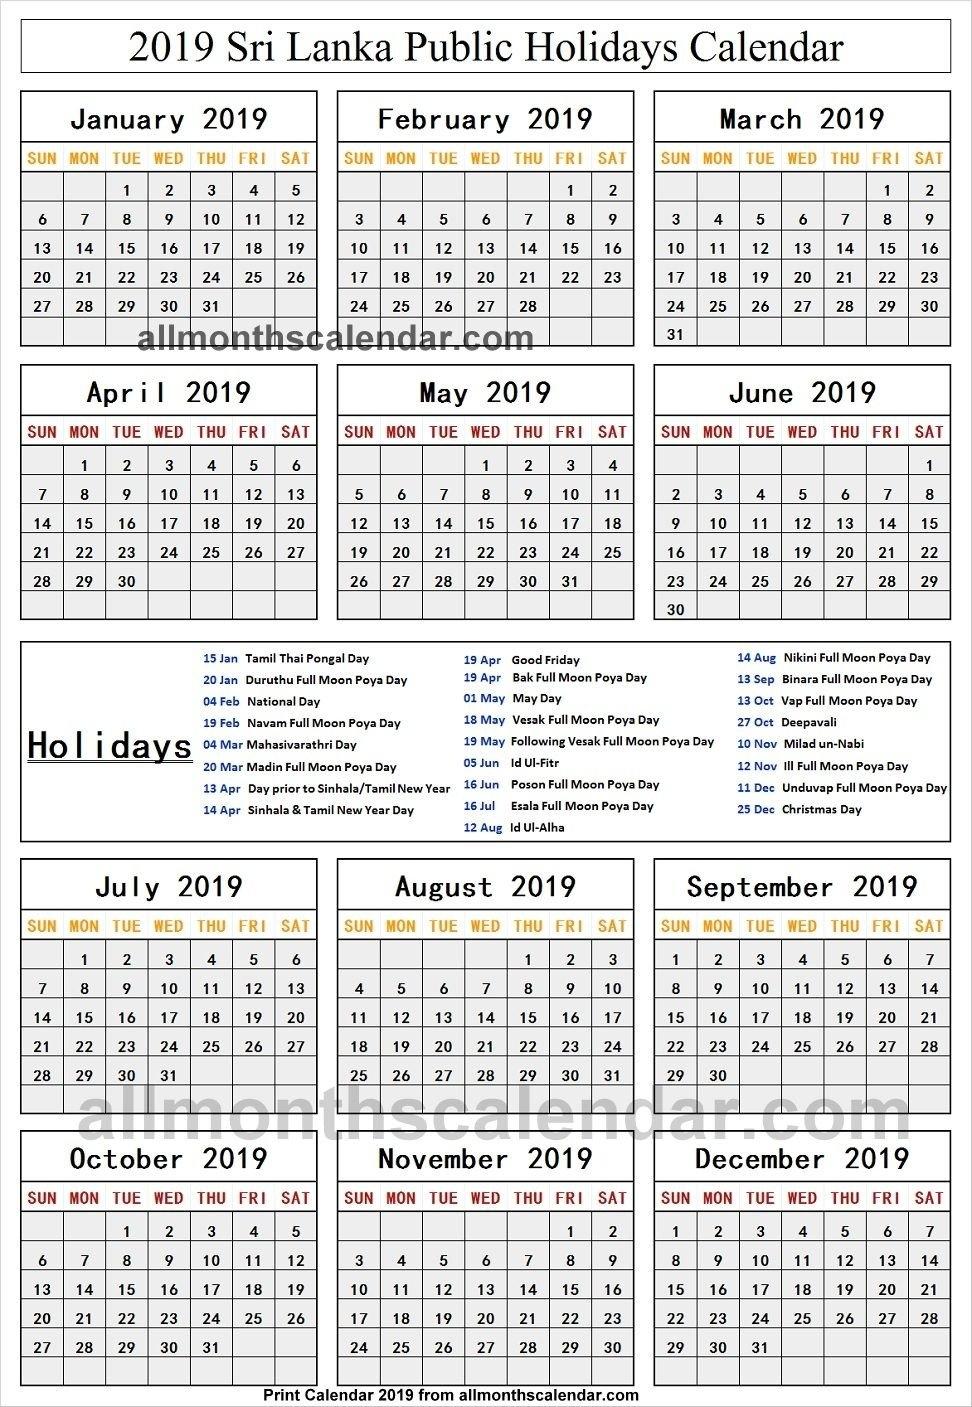 Sri Lanka Holiday List 2019 | Holidays Calendar 2019 | Holiday Calendar 2019 Holidays List